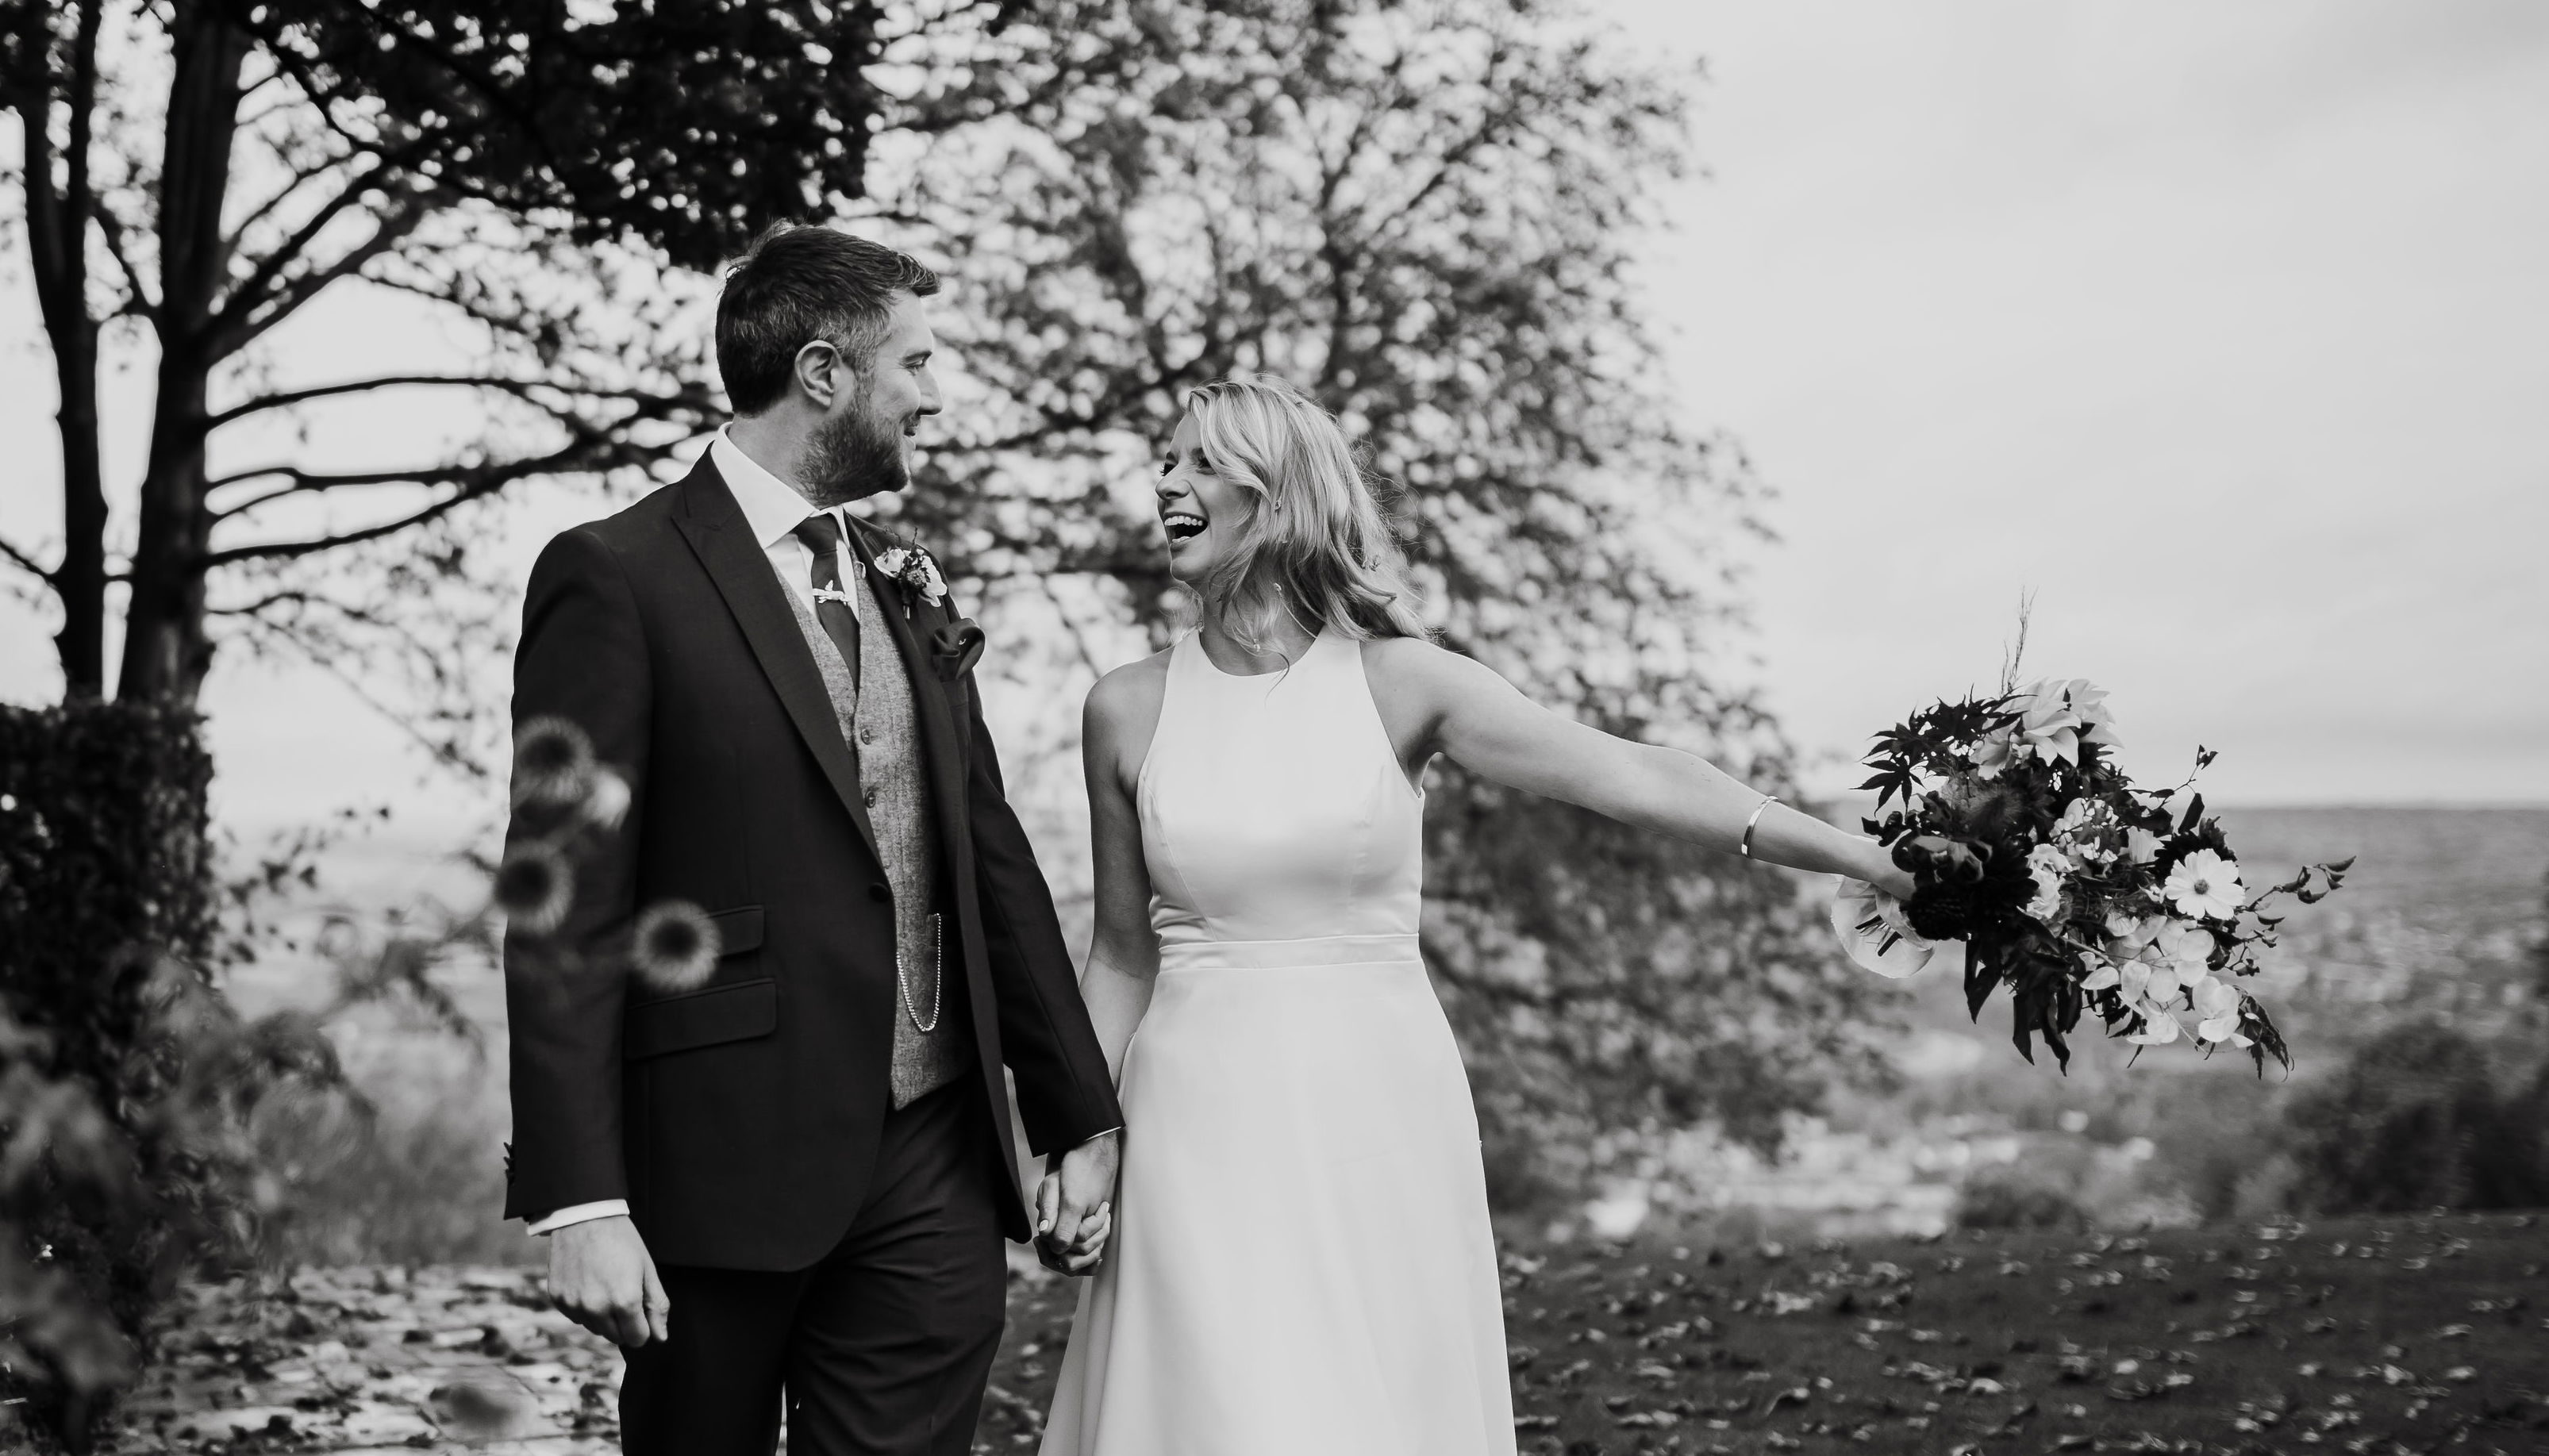 Modern, documentary wedding photographer in Bristol, Somerset. Bristol Contemporary Photography provides wedding photography in Bristol, wedding photography in Somerset and wedding photography in Avon.